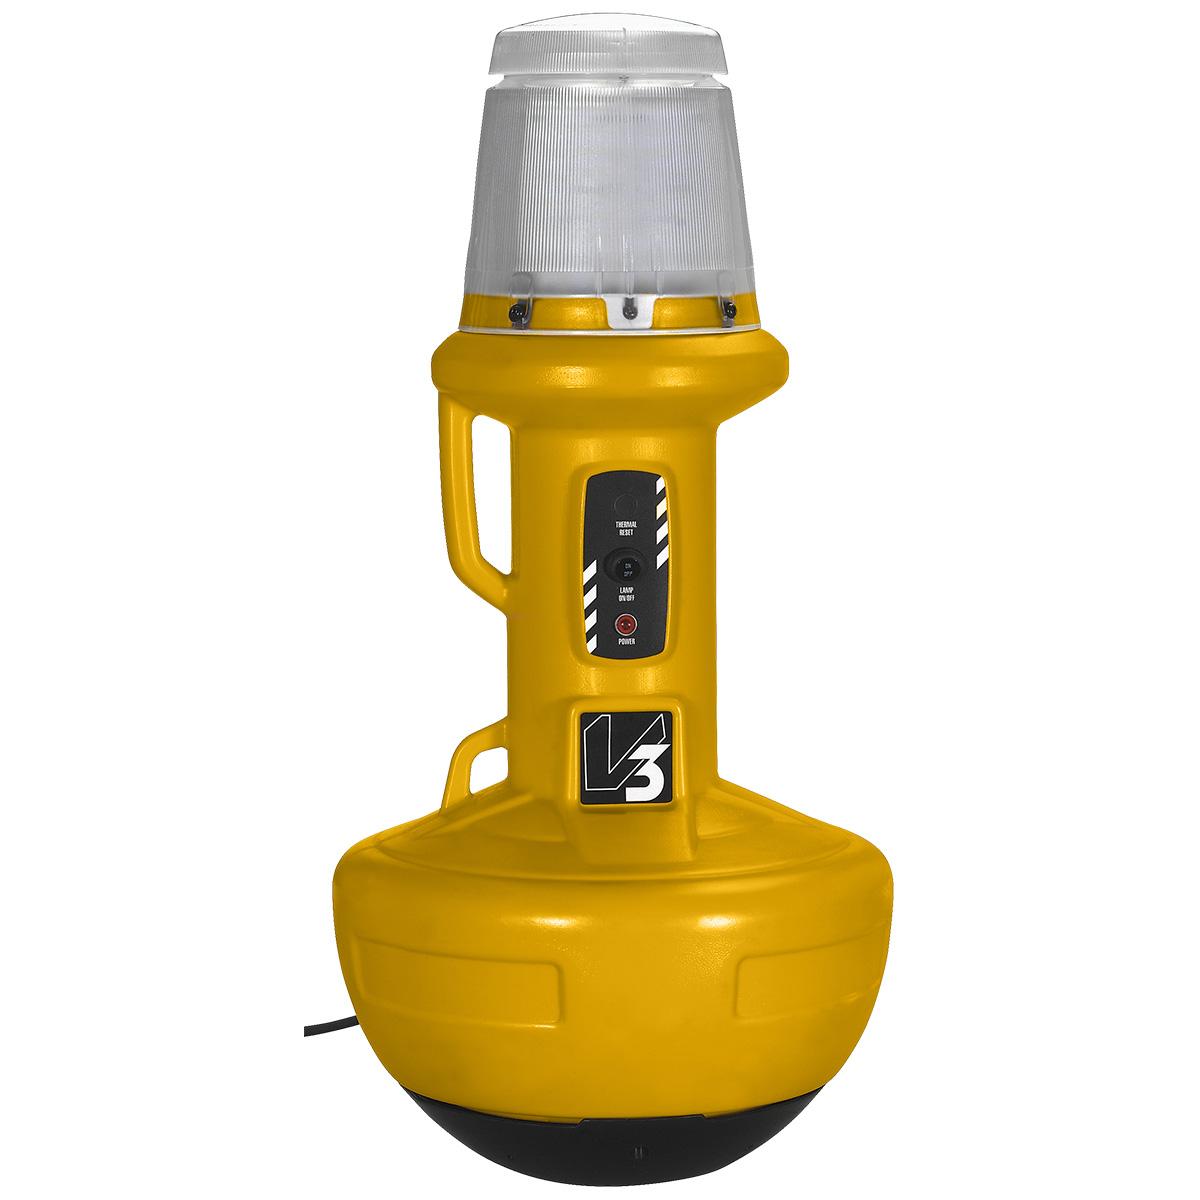 Wobblelight® V3 200W